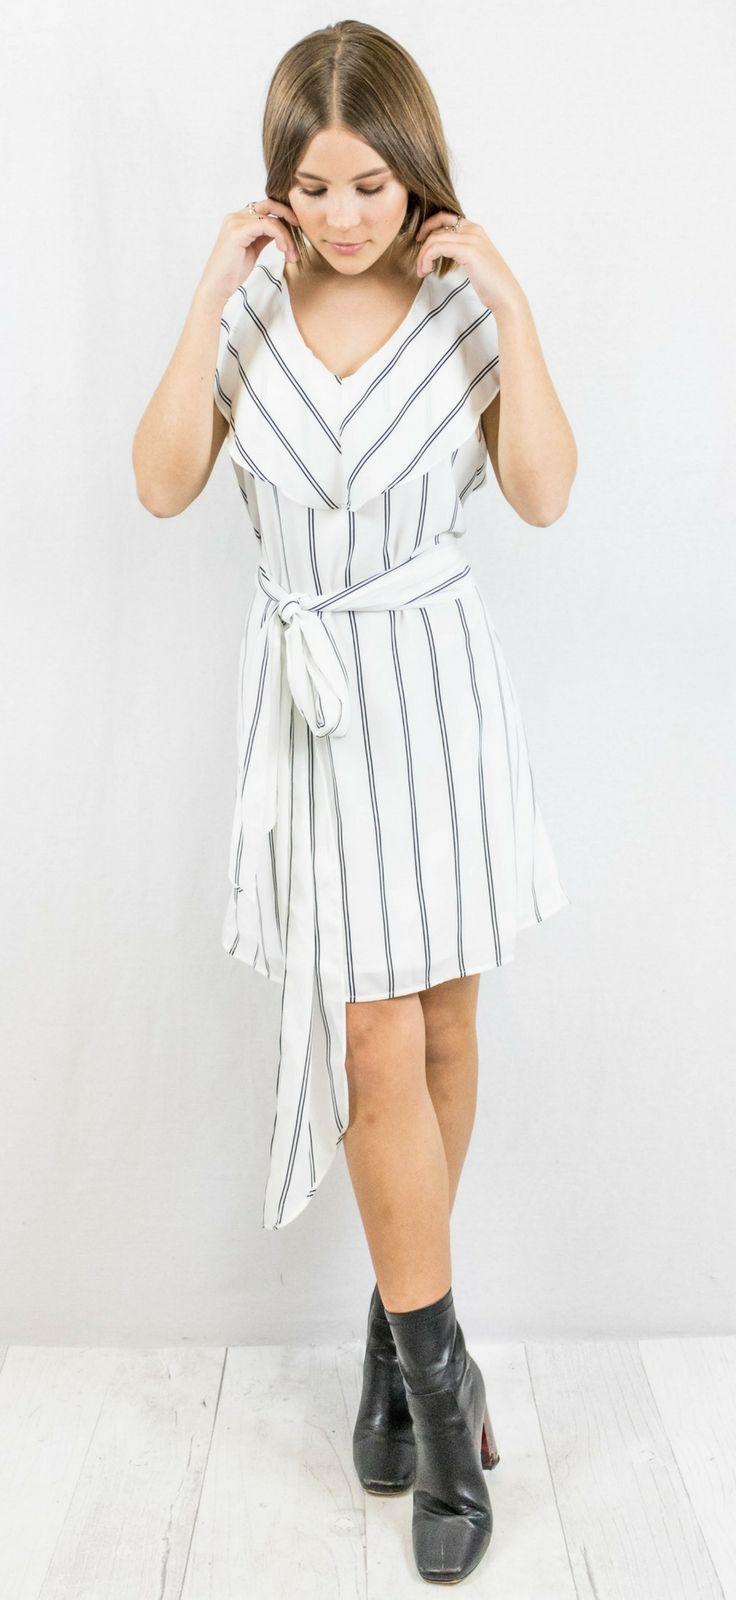 Vertical Striped Dress  35.00    work dress 284cdca0f